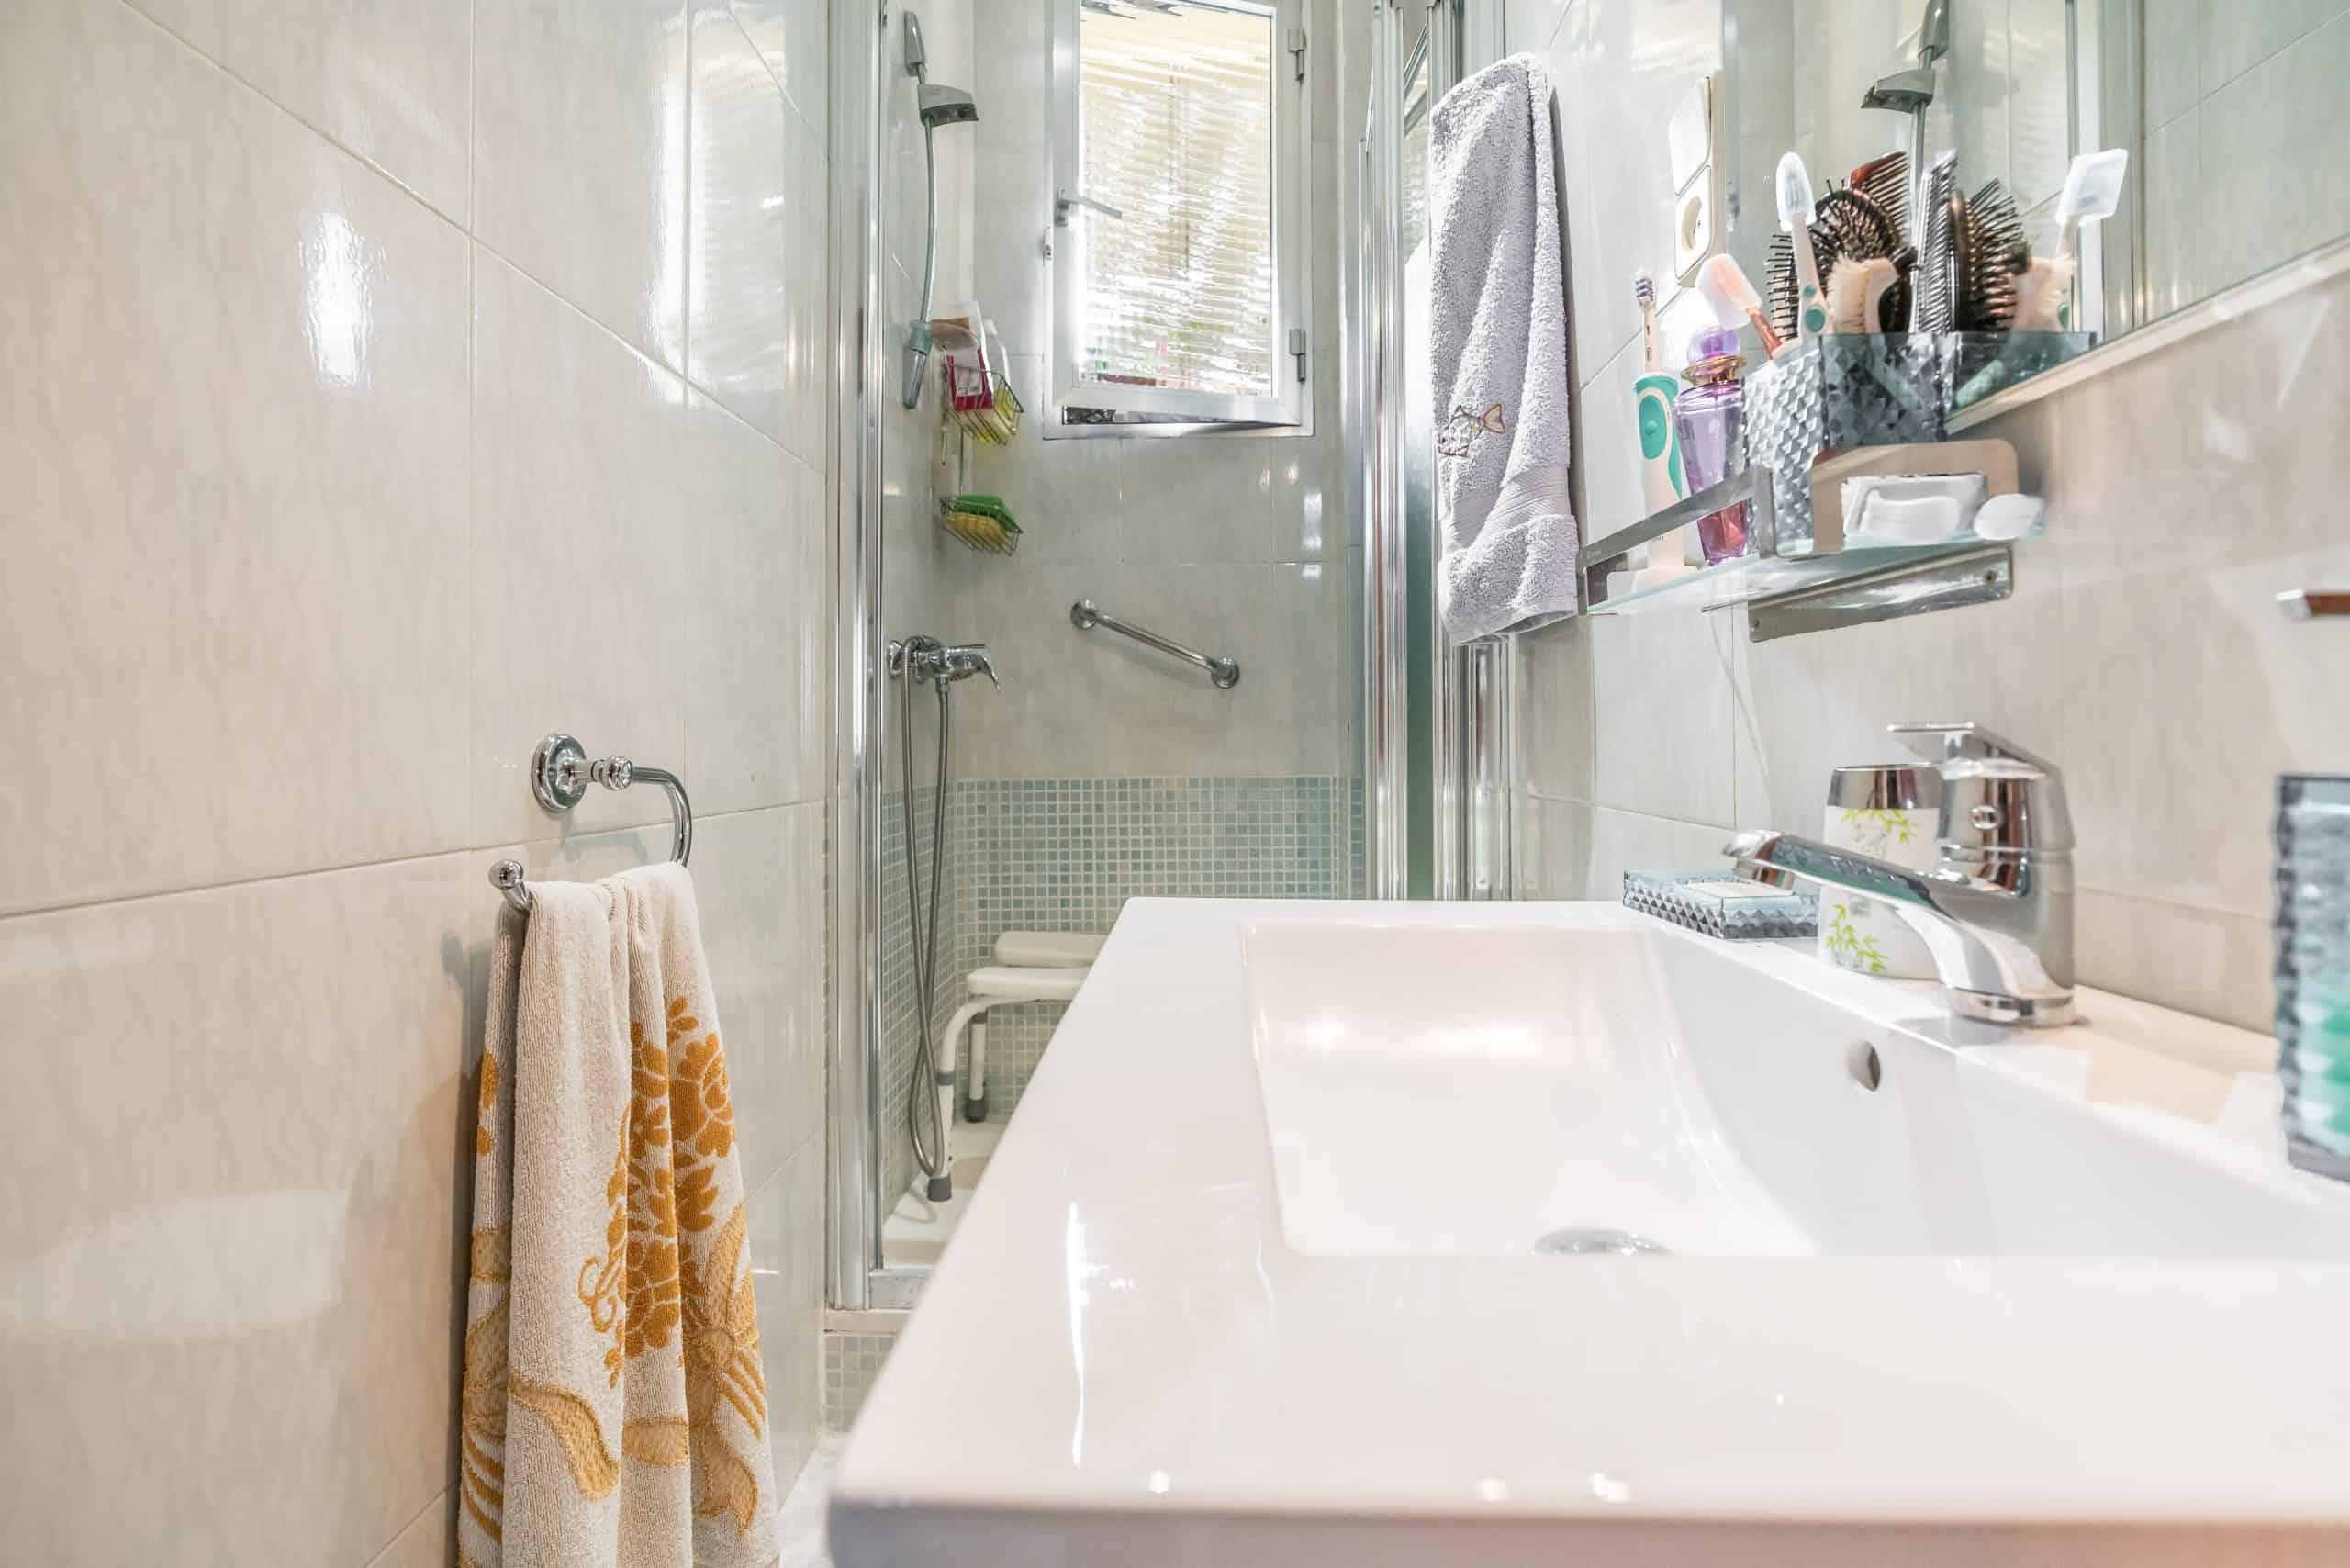 Agencia Inmobiliaria de Madrid-FUTUROCASA-Zona ARGANZUELA-EMBAJADORES-LEGAZPI3 BAÑO1 (3)